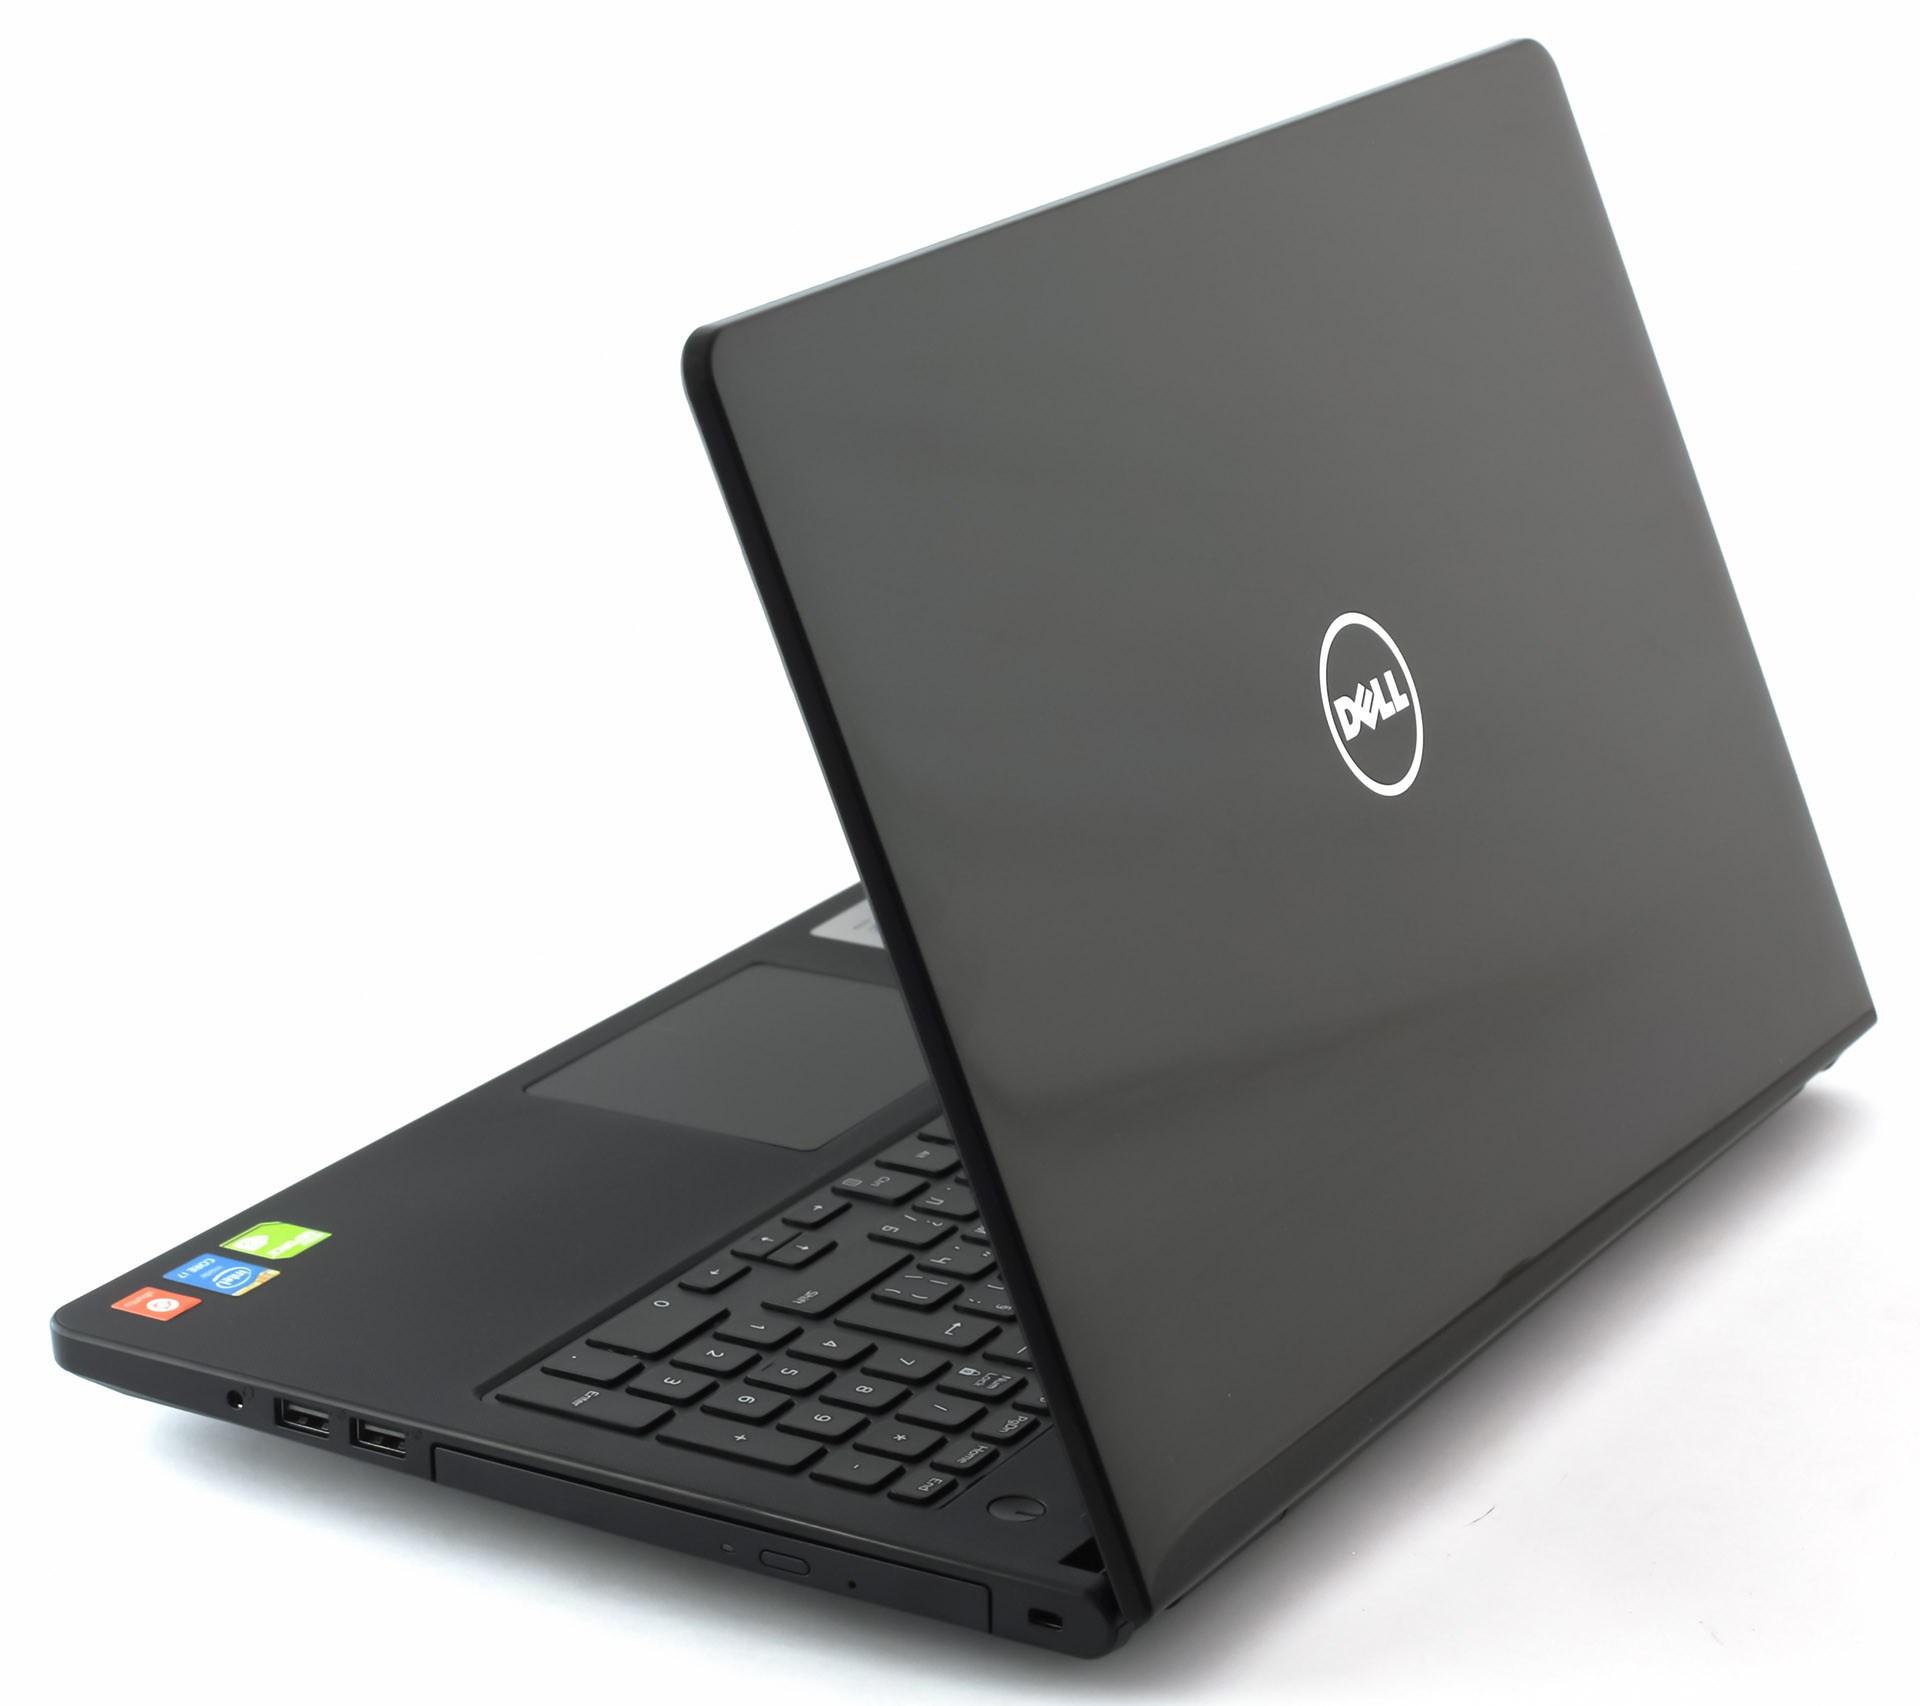 لابتوب DELL 15 5558 - كور i5 جيل خامس - كارت Nvidia أساسي 2 جيجا